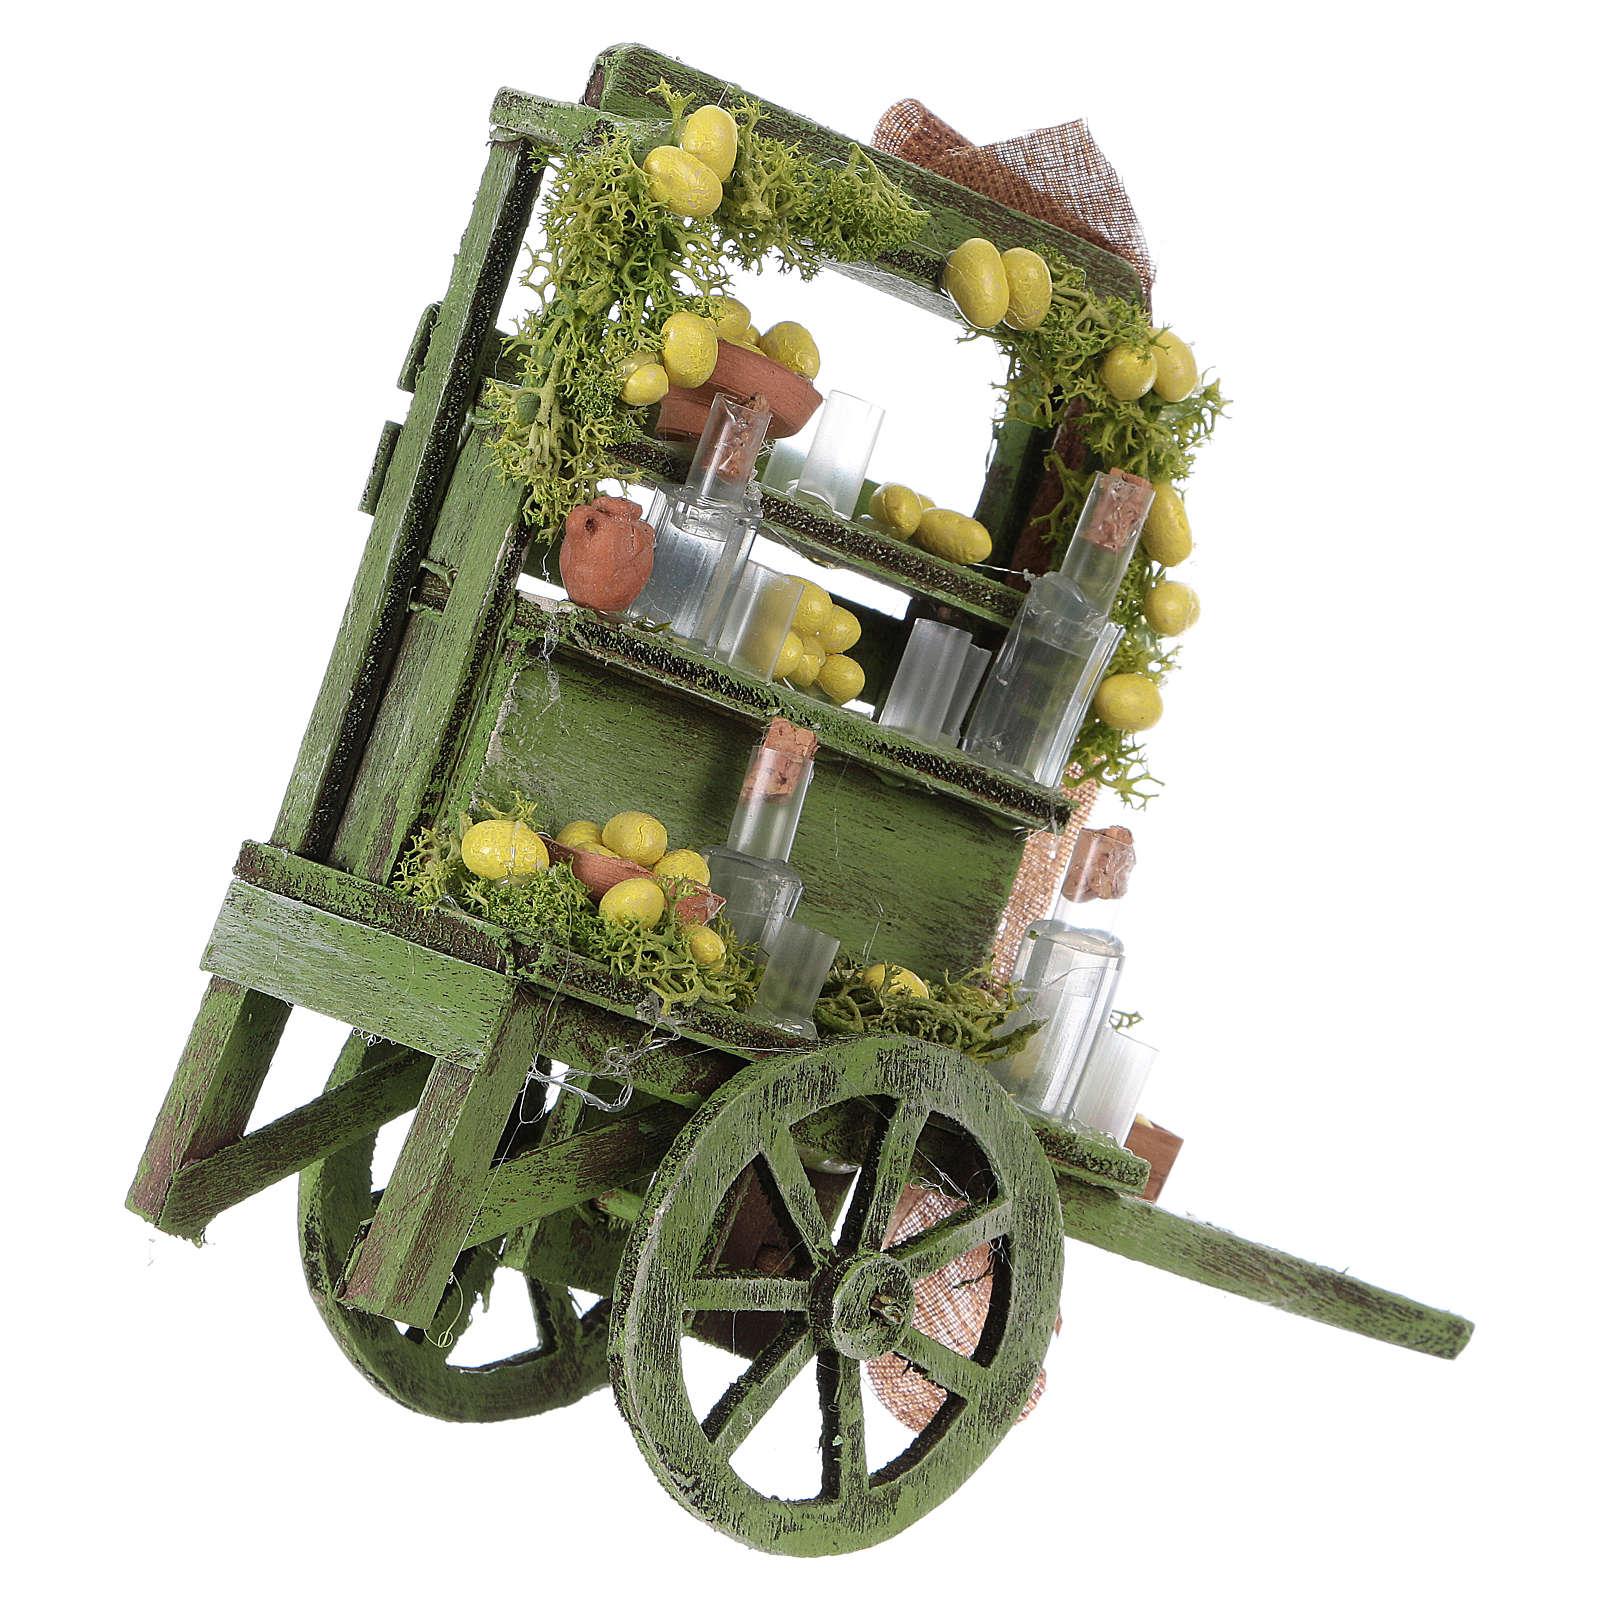 Carro con limones belén napolitano 15x15x6 cm 4